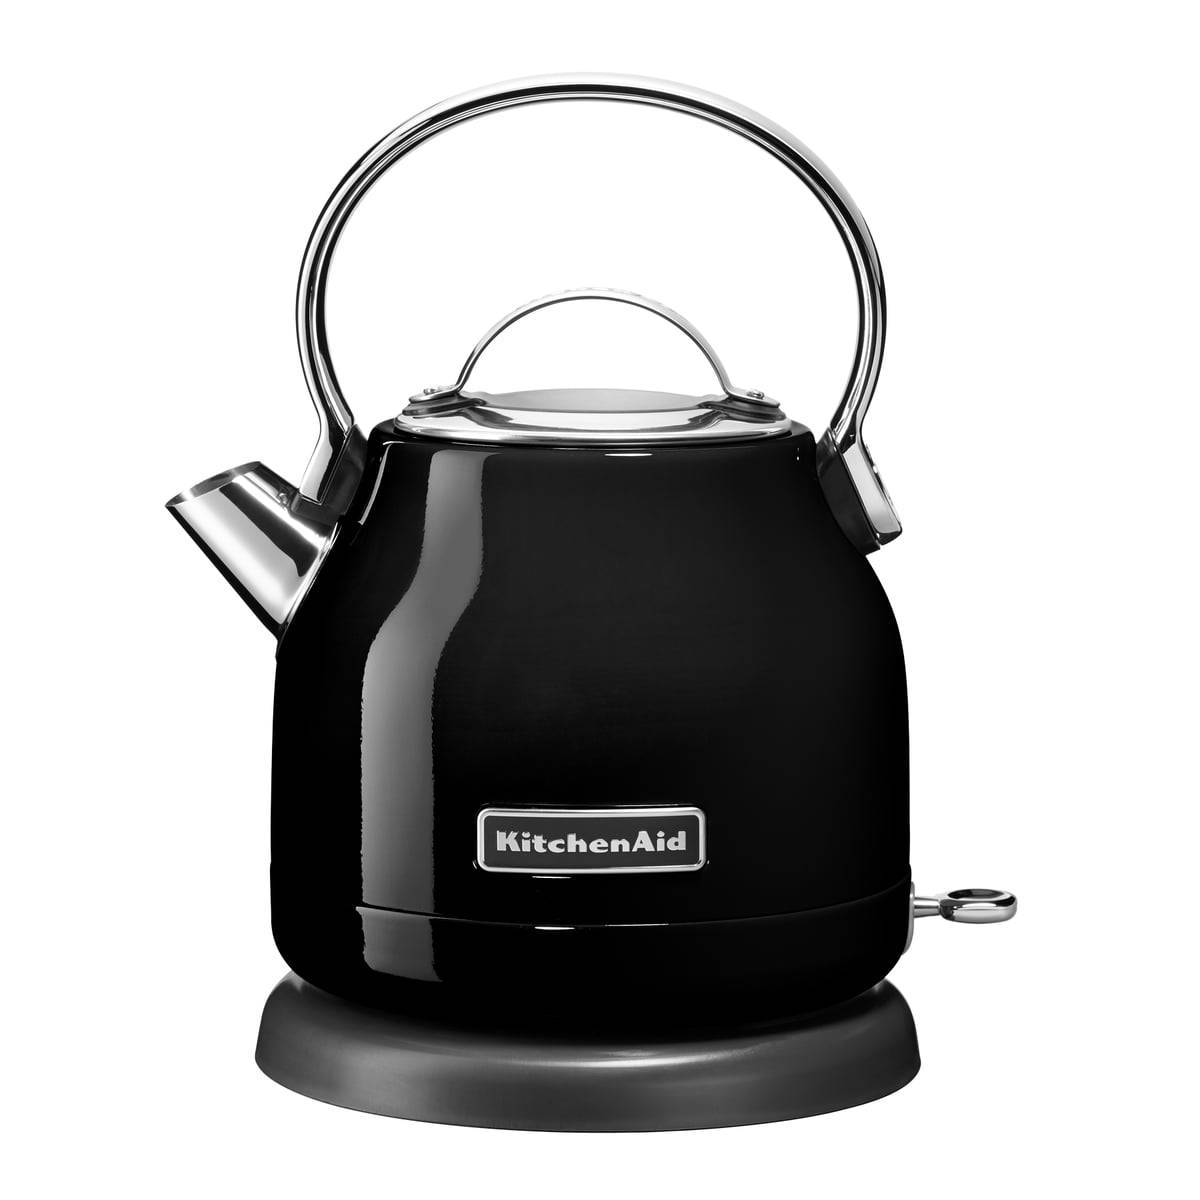 KitchenAid - Wasserkocher 1,25 l (5KEK1222), onyx schwarz